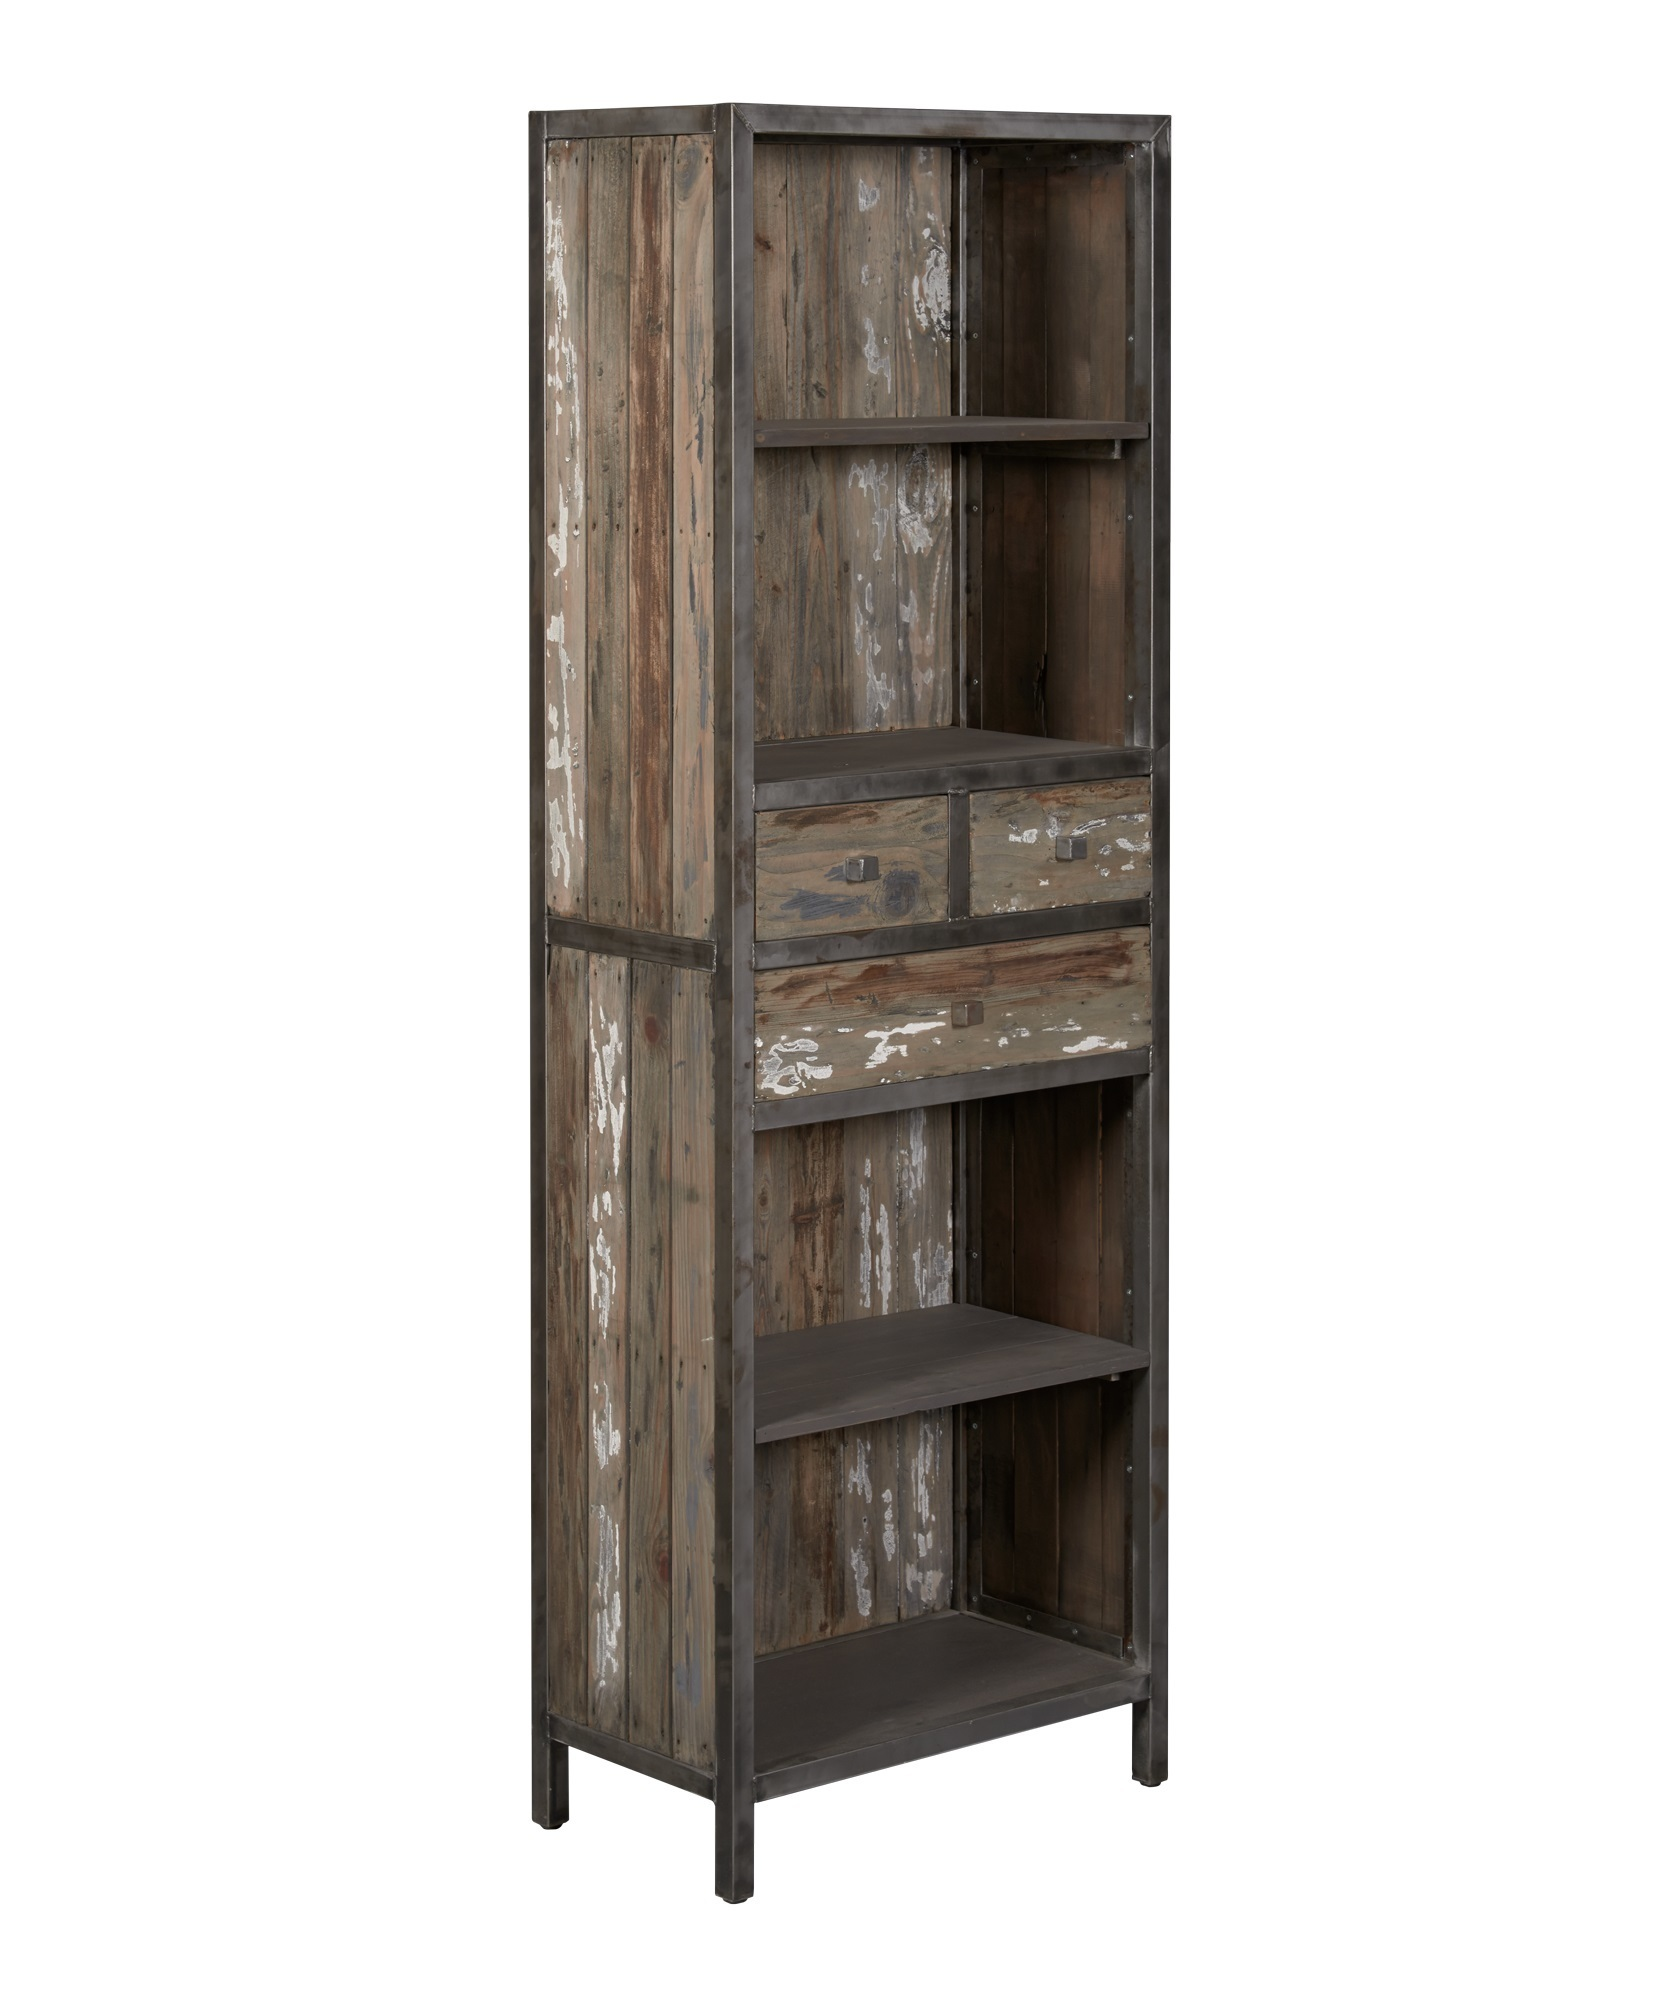 kasten-wouter-boekenkast-towerliving-KL 0143-65cm-oud grenen-grijs-vintage-metaal-industrieel